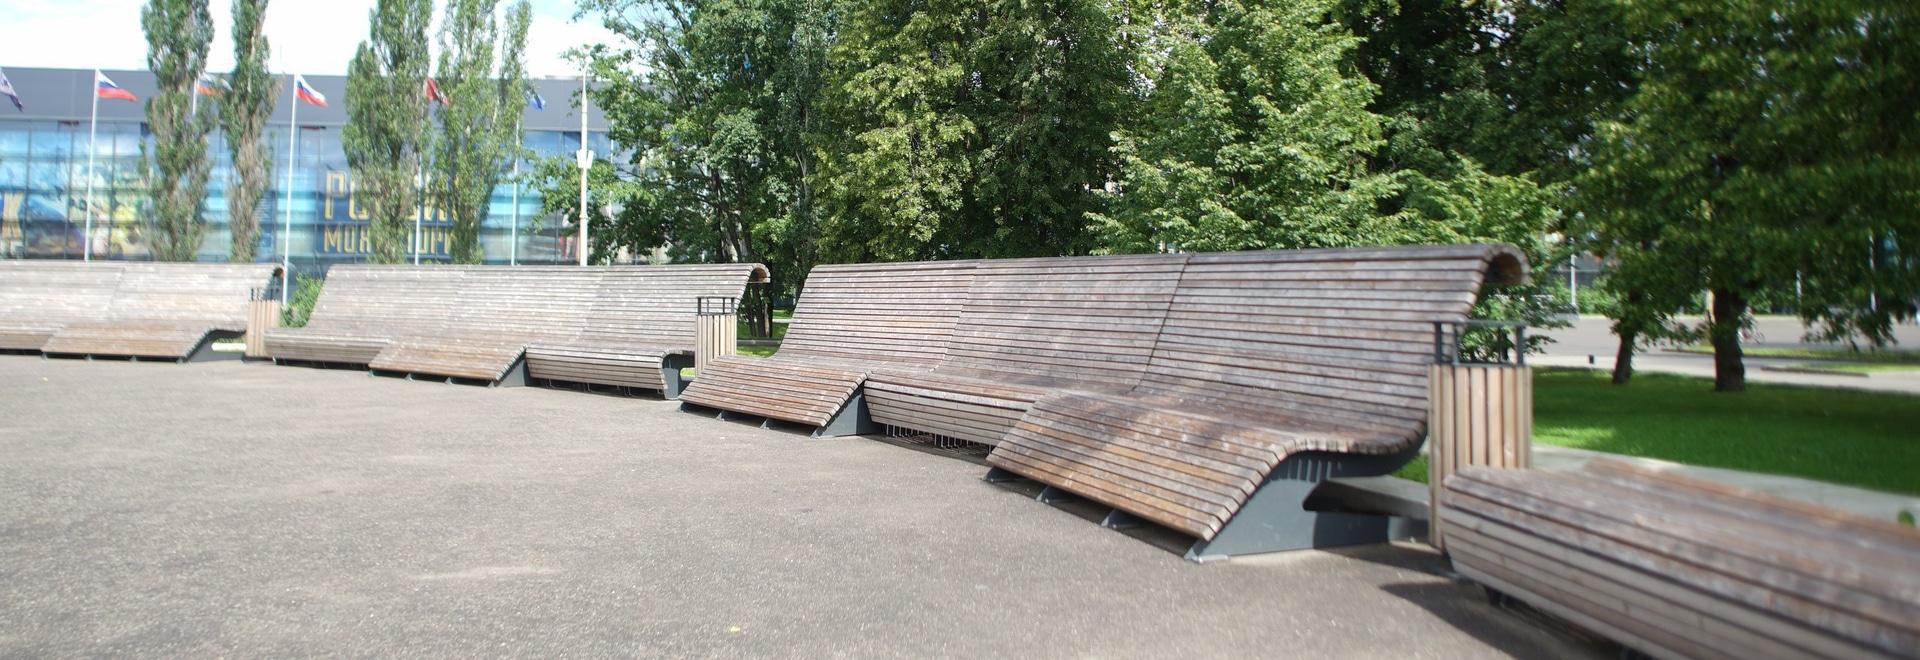 Fläche in 57 Pavillons im VDNKh, Moskau